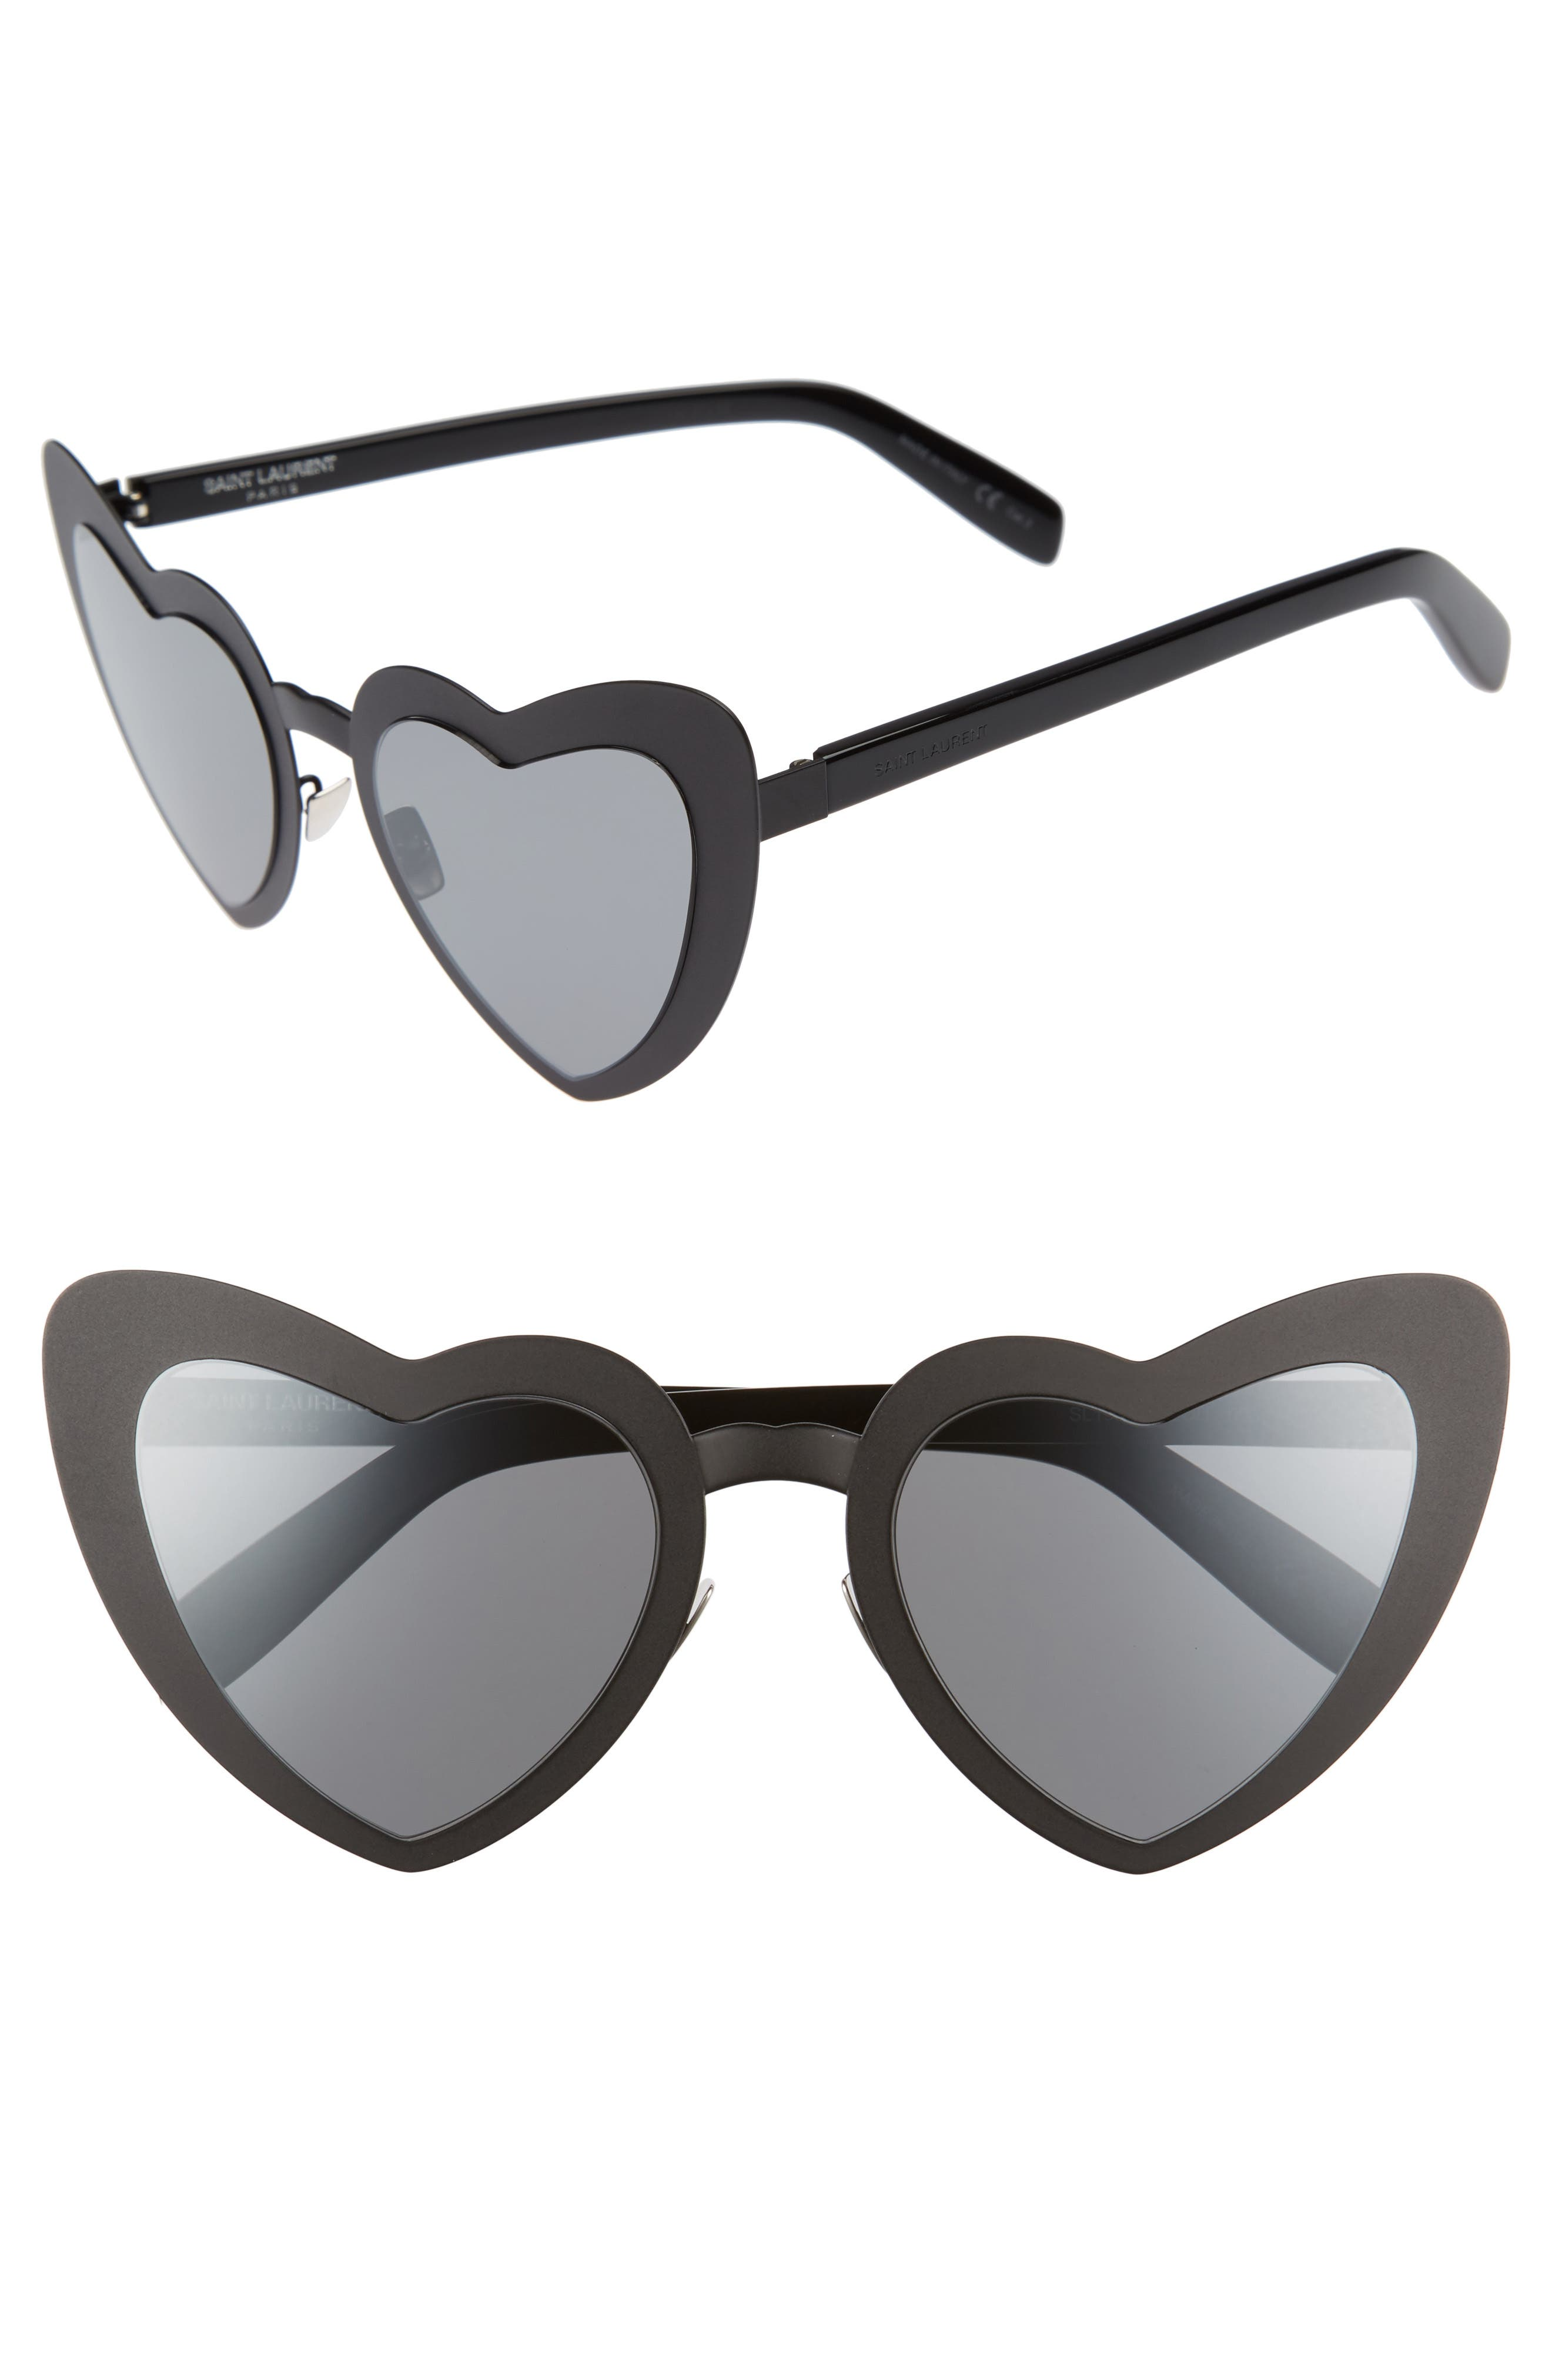 Loulou 55mm Heart Shaped Sunglasses,                         Main,                         color, Black